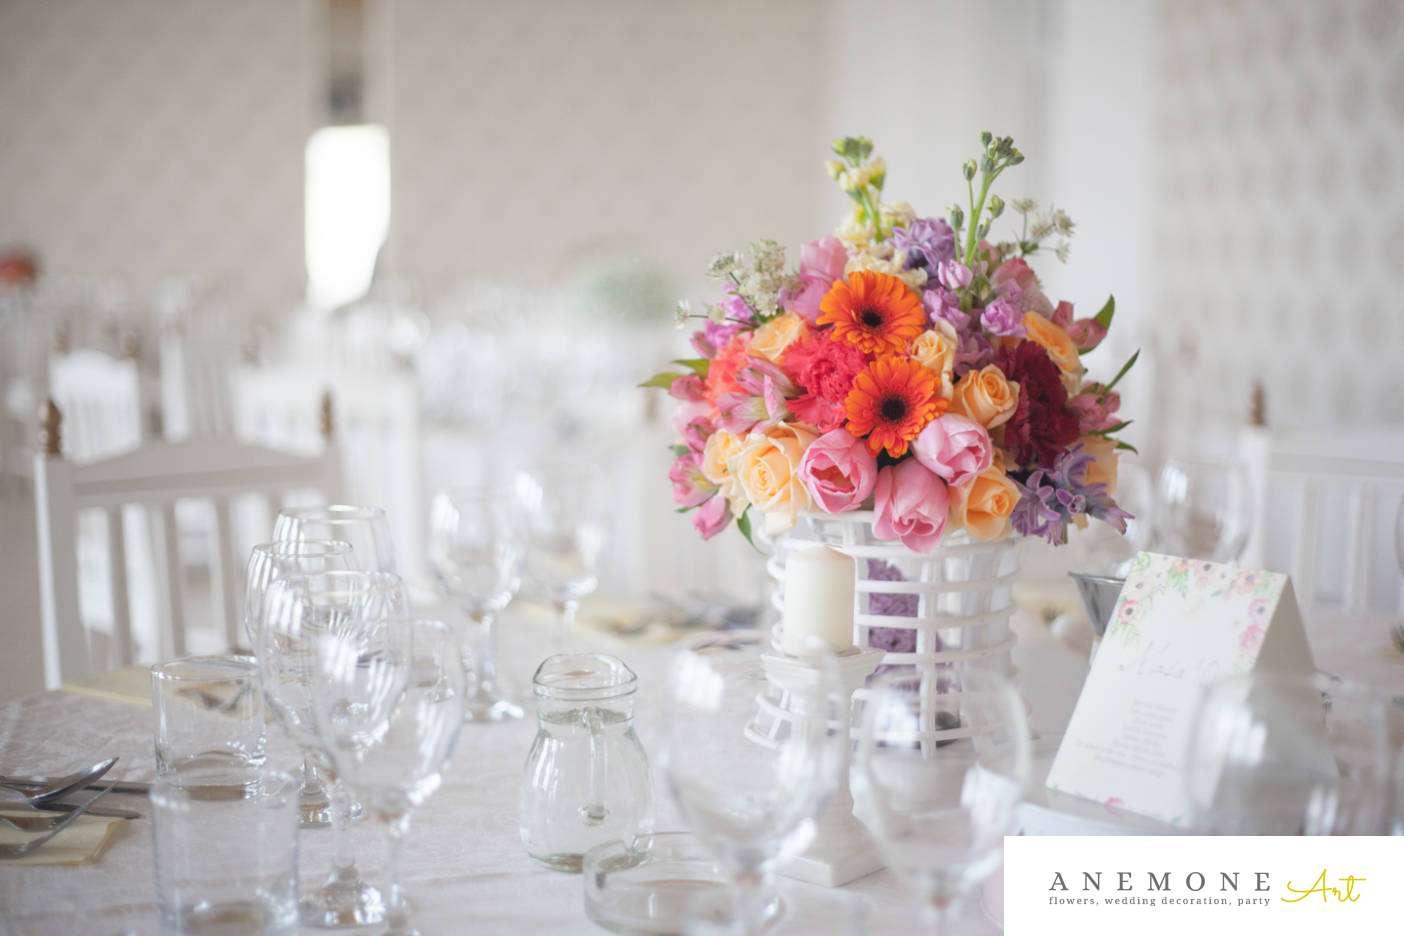 Poza, foto cu Flori de nunta decor masa, milenium garden in Arad, Timisoara, Oradea (wedding flowers, bouquets) nunta Arad